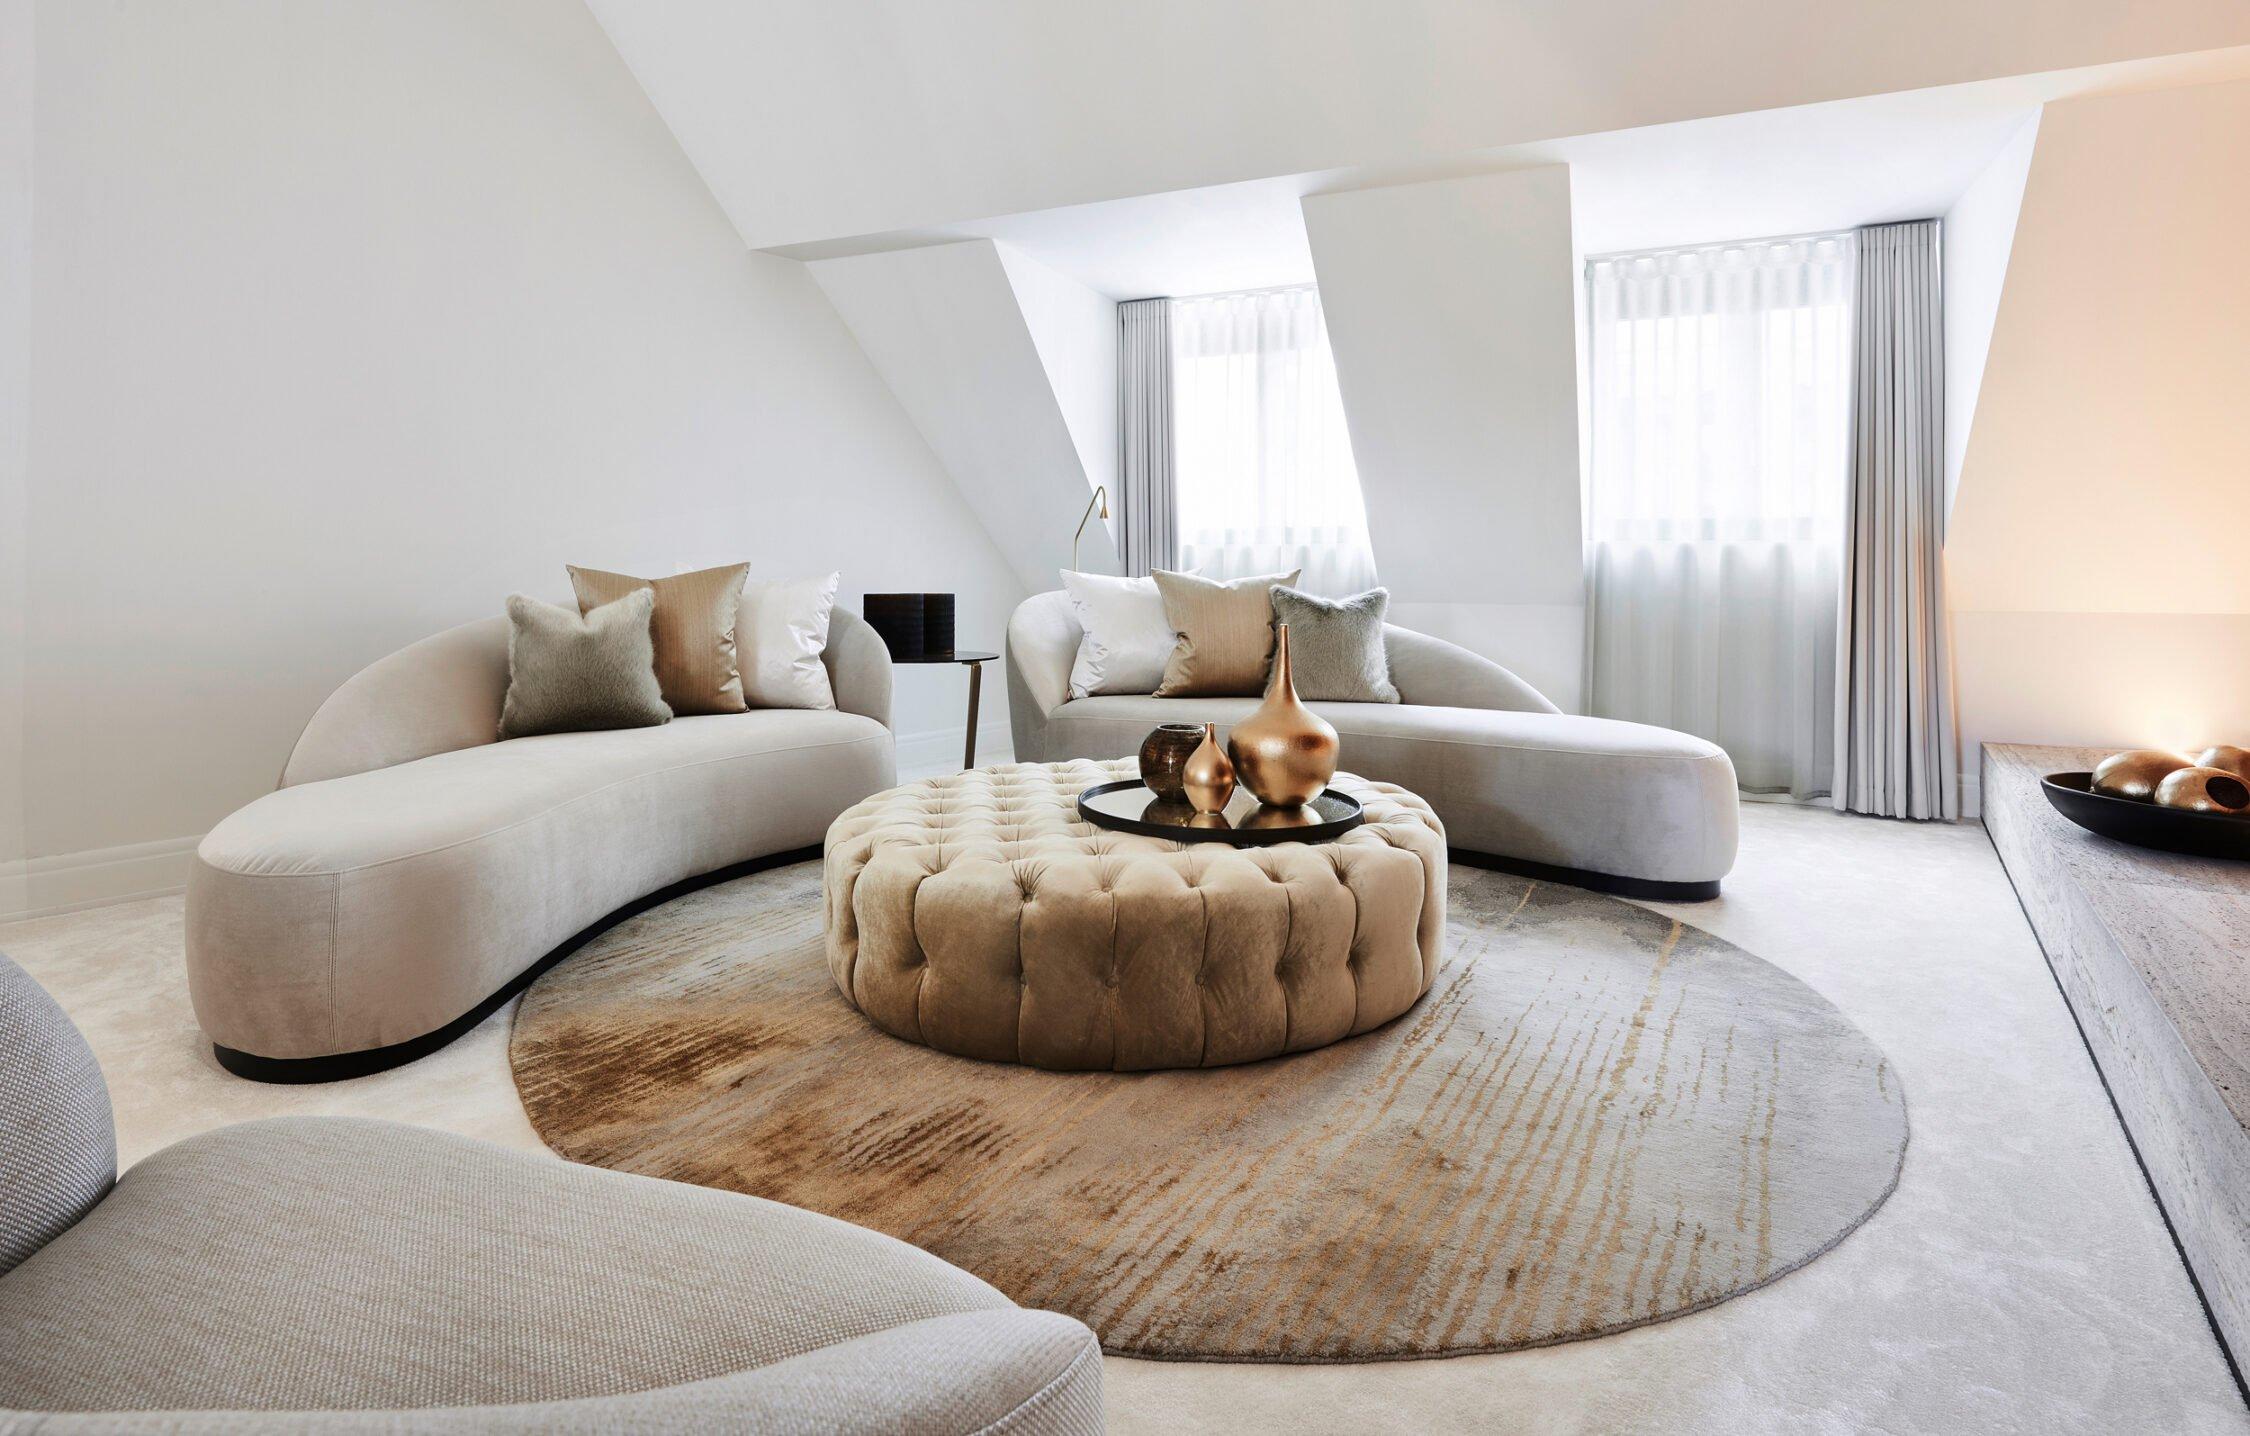 interior design beige couch gold details circle carpet